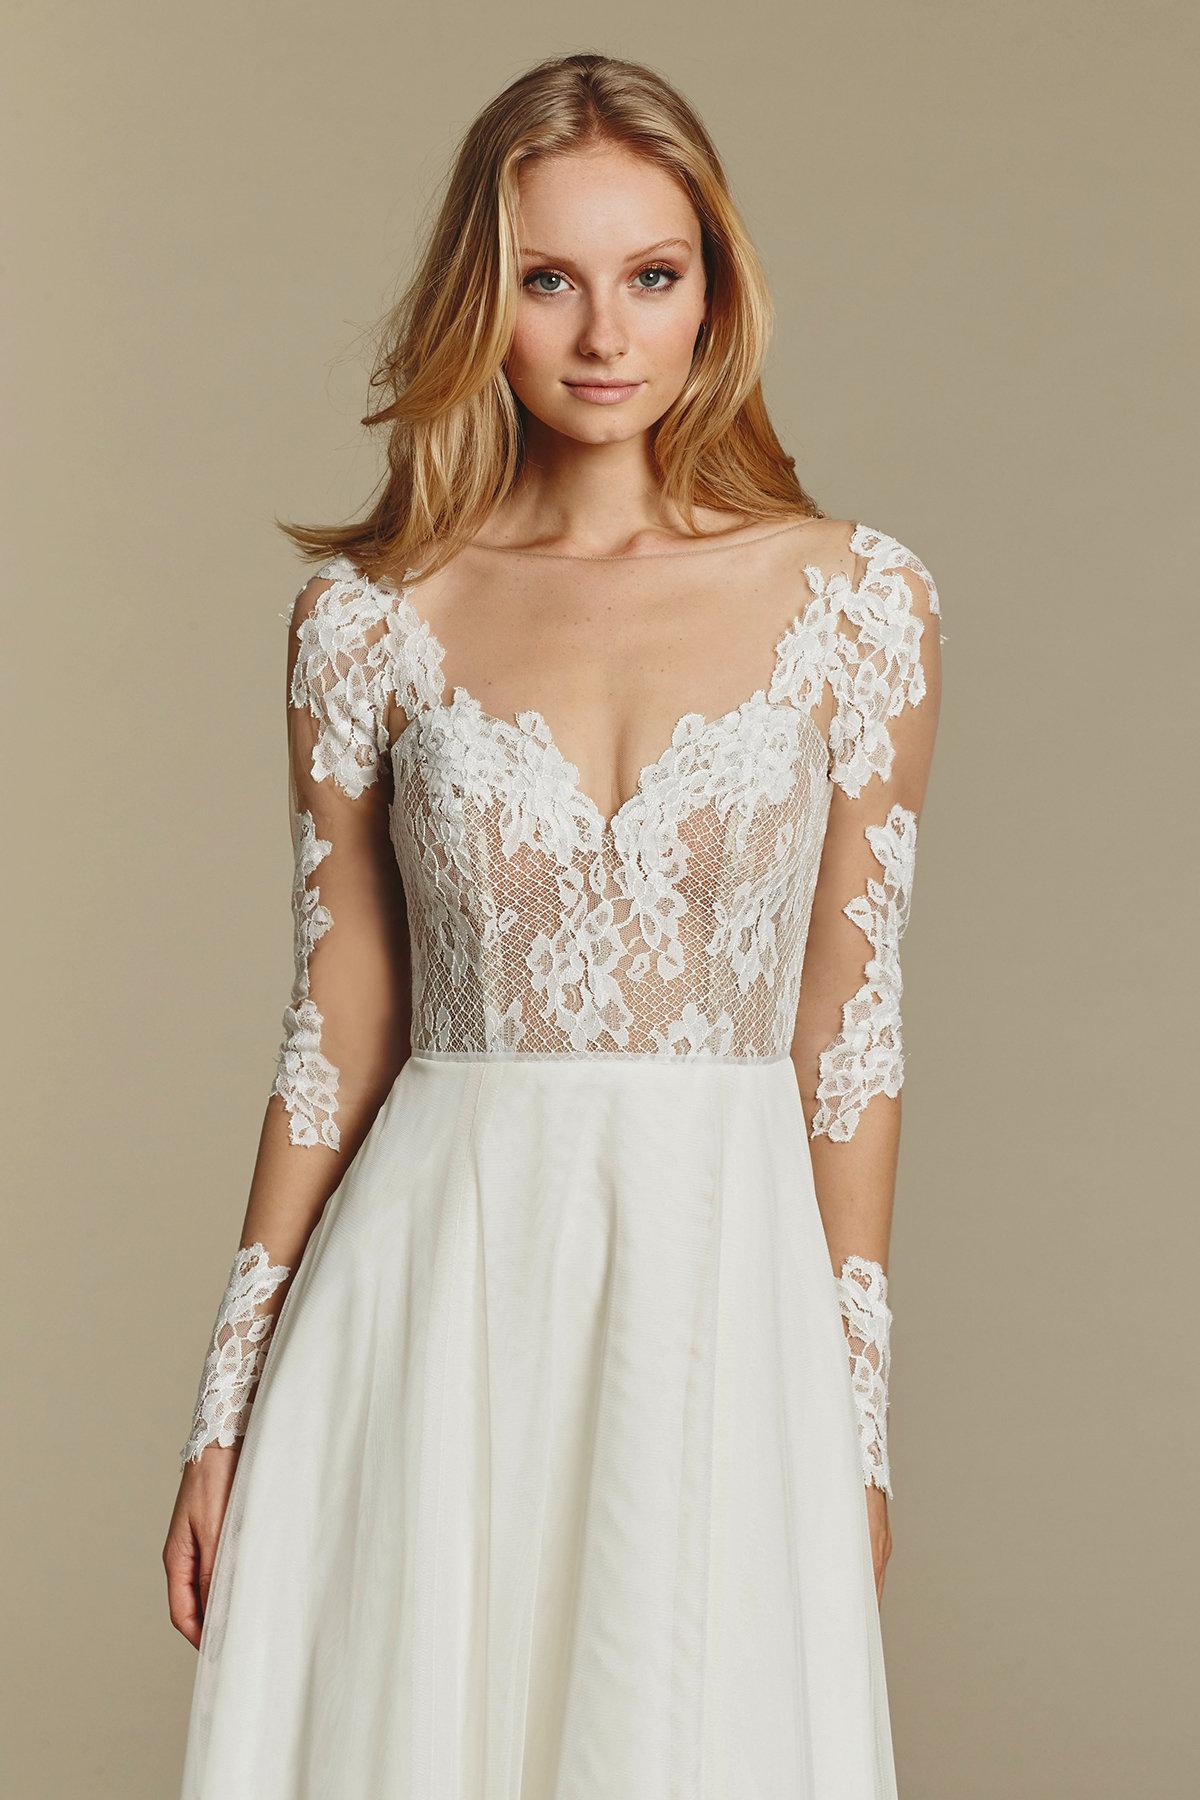 Tara Kely Weding Dreses 016 - Tara Kely Weding Dreses